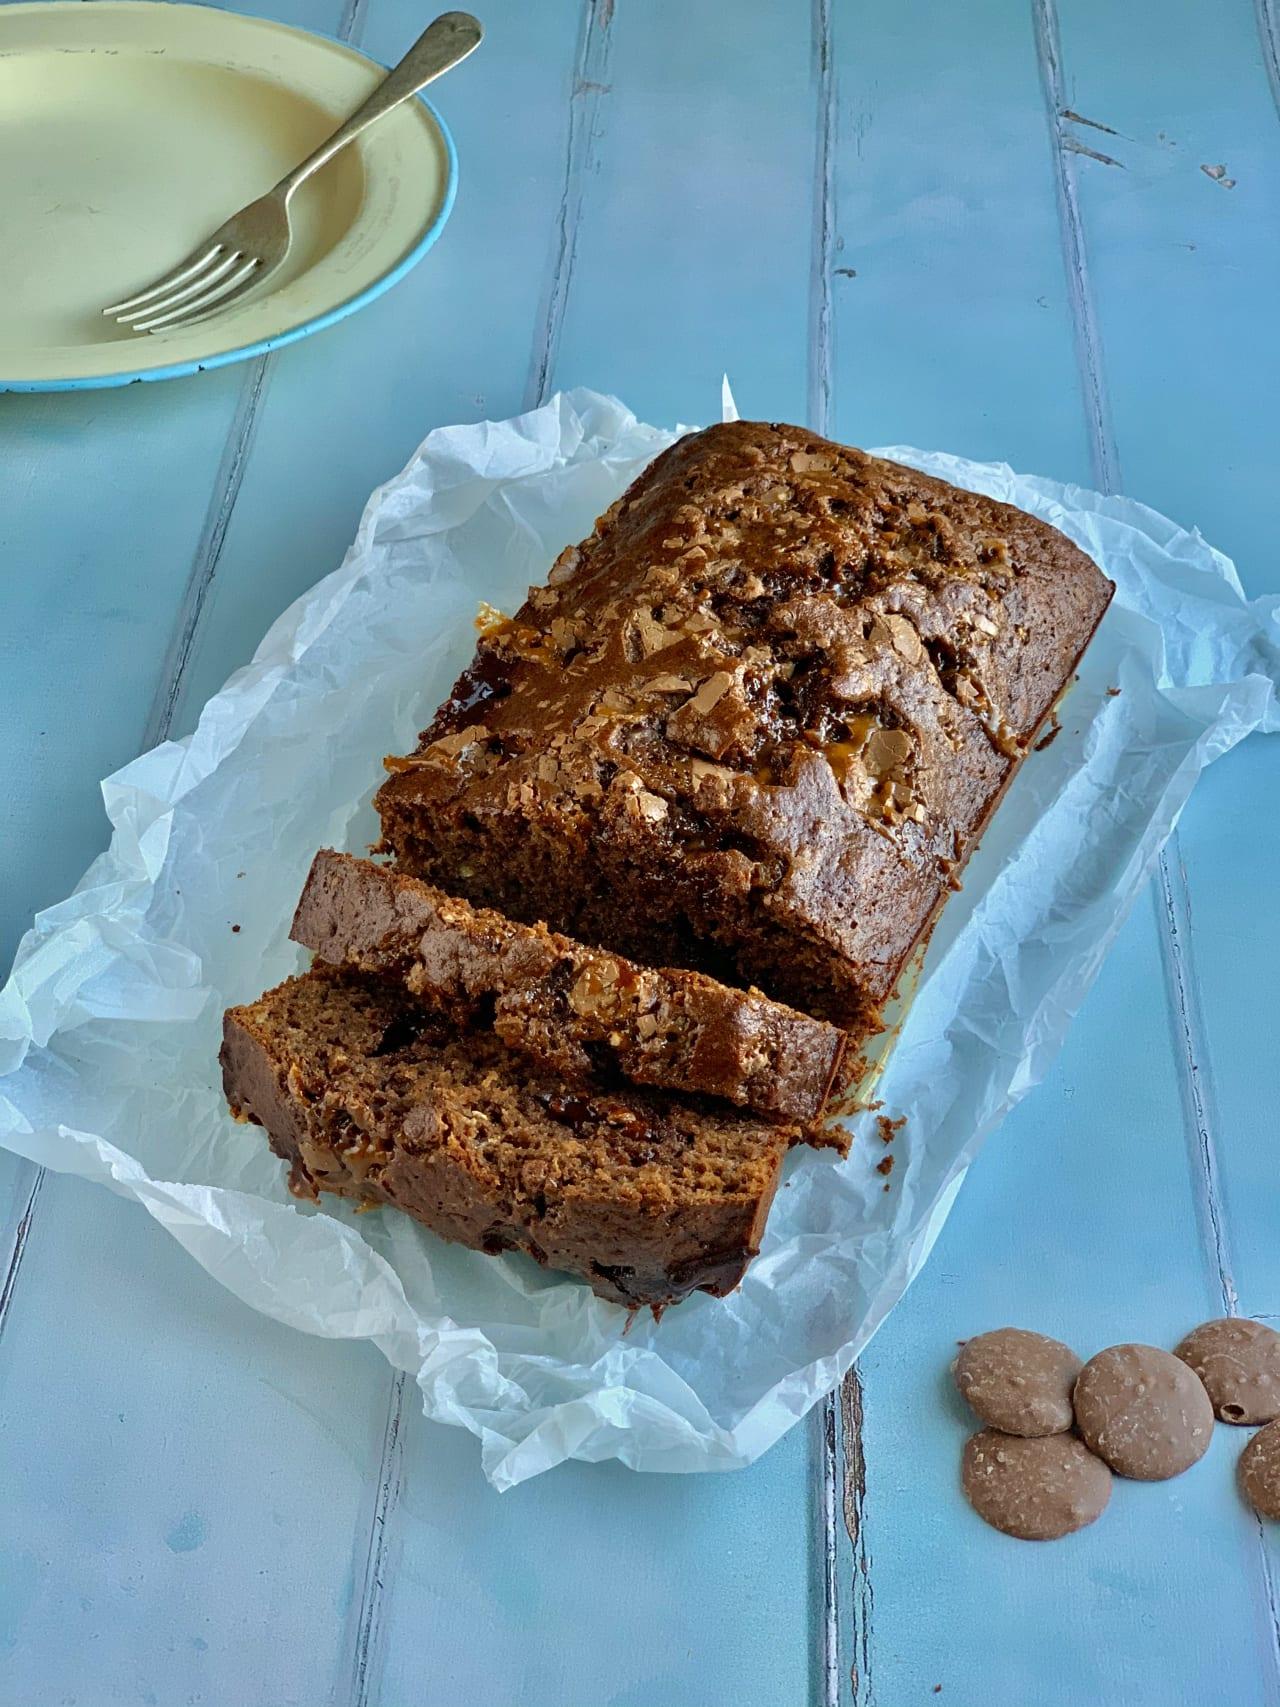 Daim Bar Chocolate and Banana Loaf